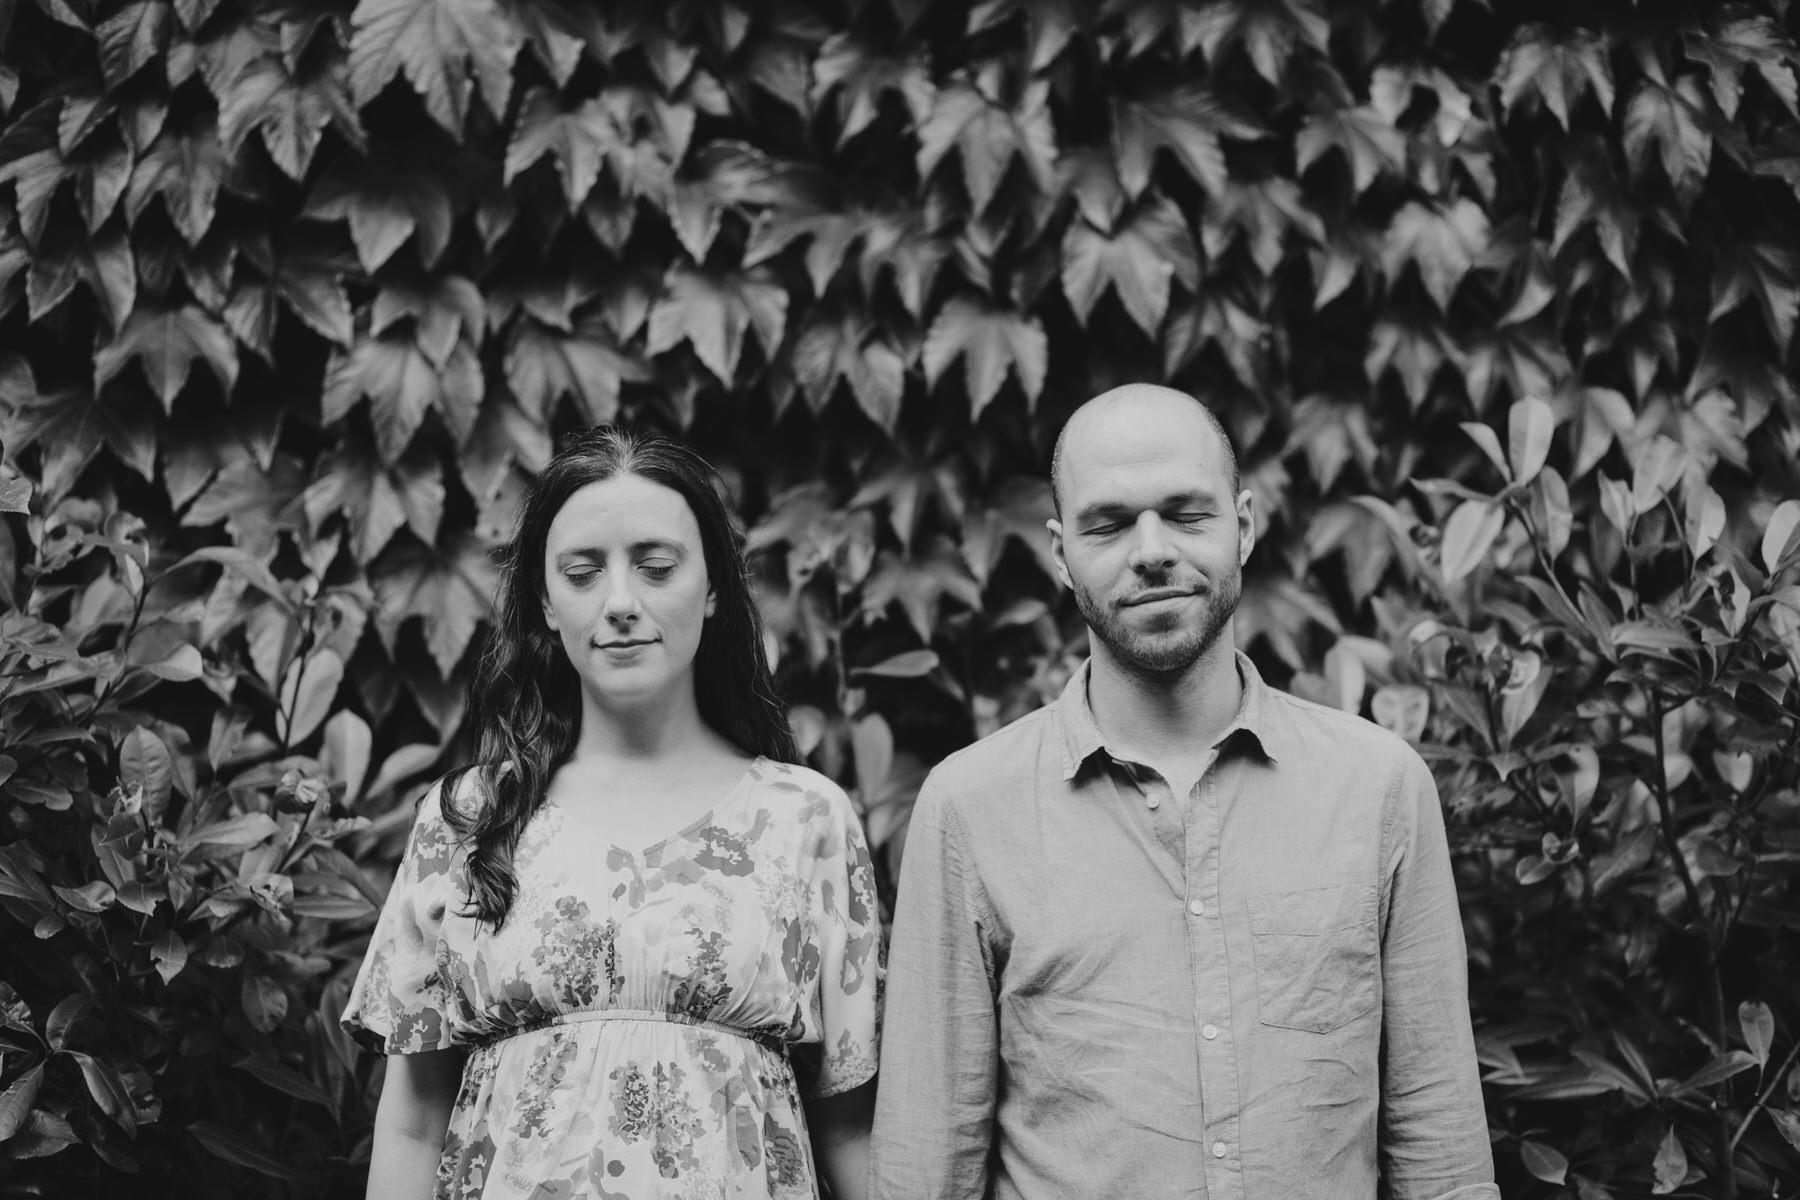 31-couple ivy wall background alternative portraits London Southbank.jpg